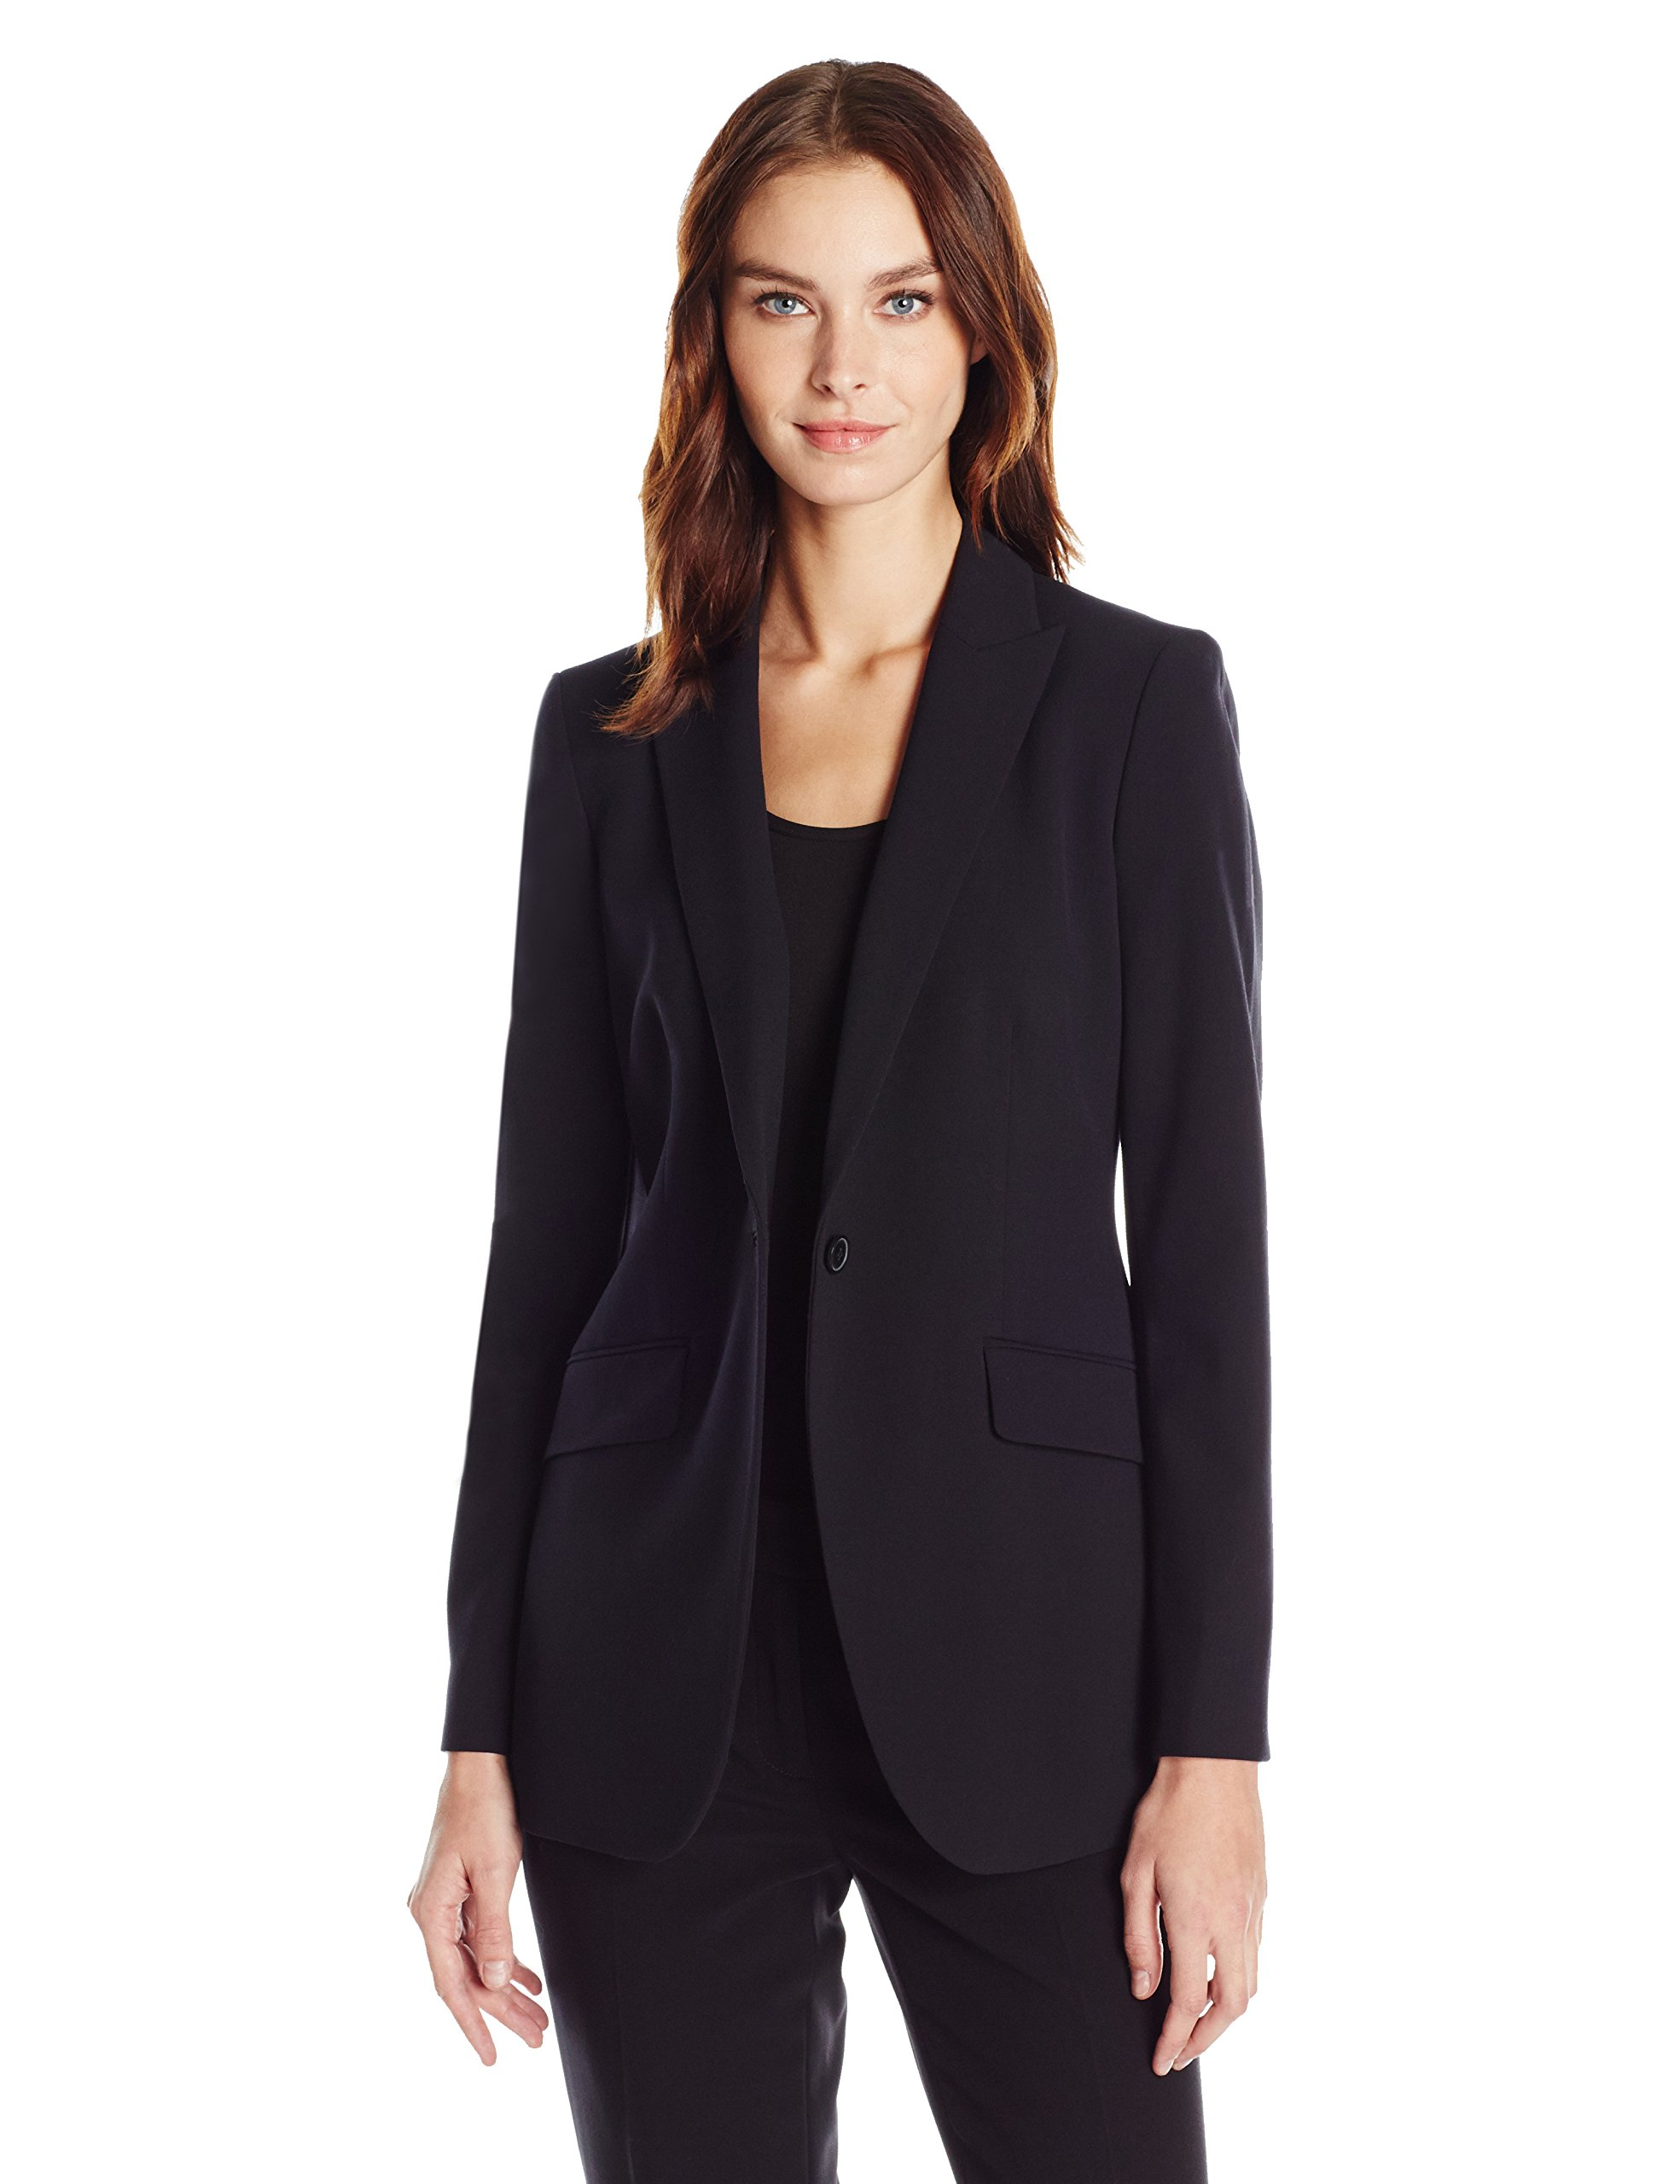 Anne Klein Women's Long 1 Button Jacket, Black, 12